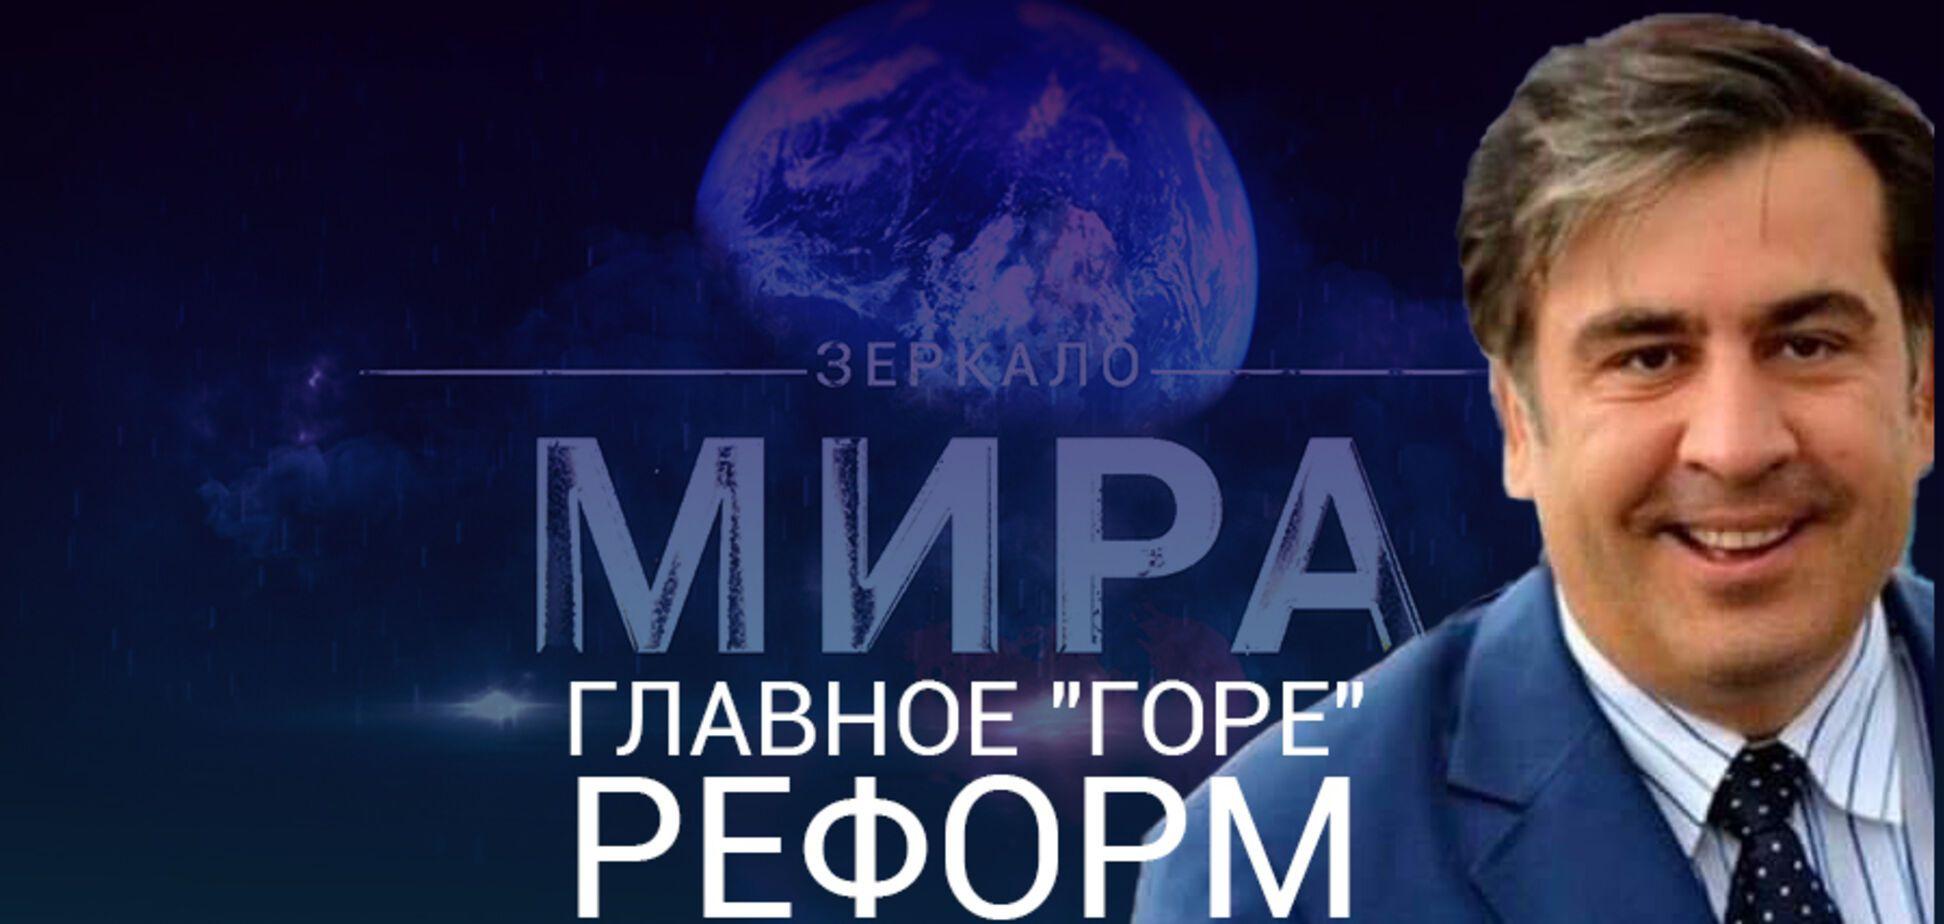 Товмач: Саакашвили - главное 'горе' реформ в Украине